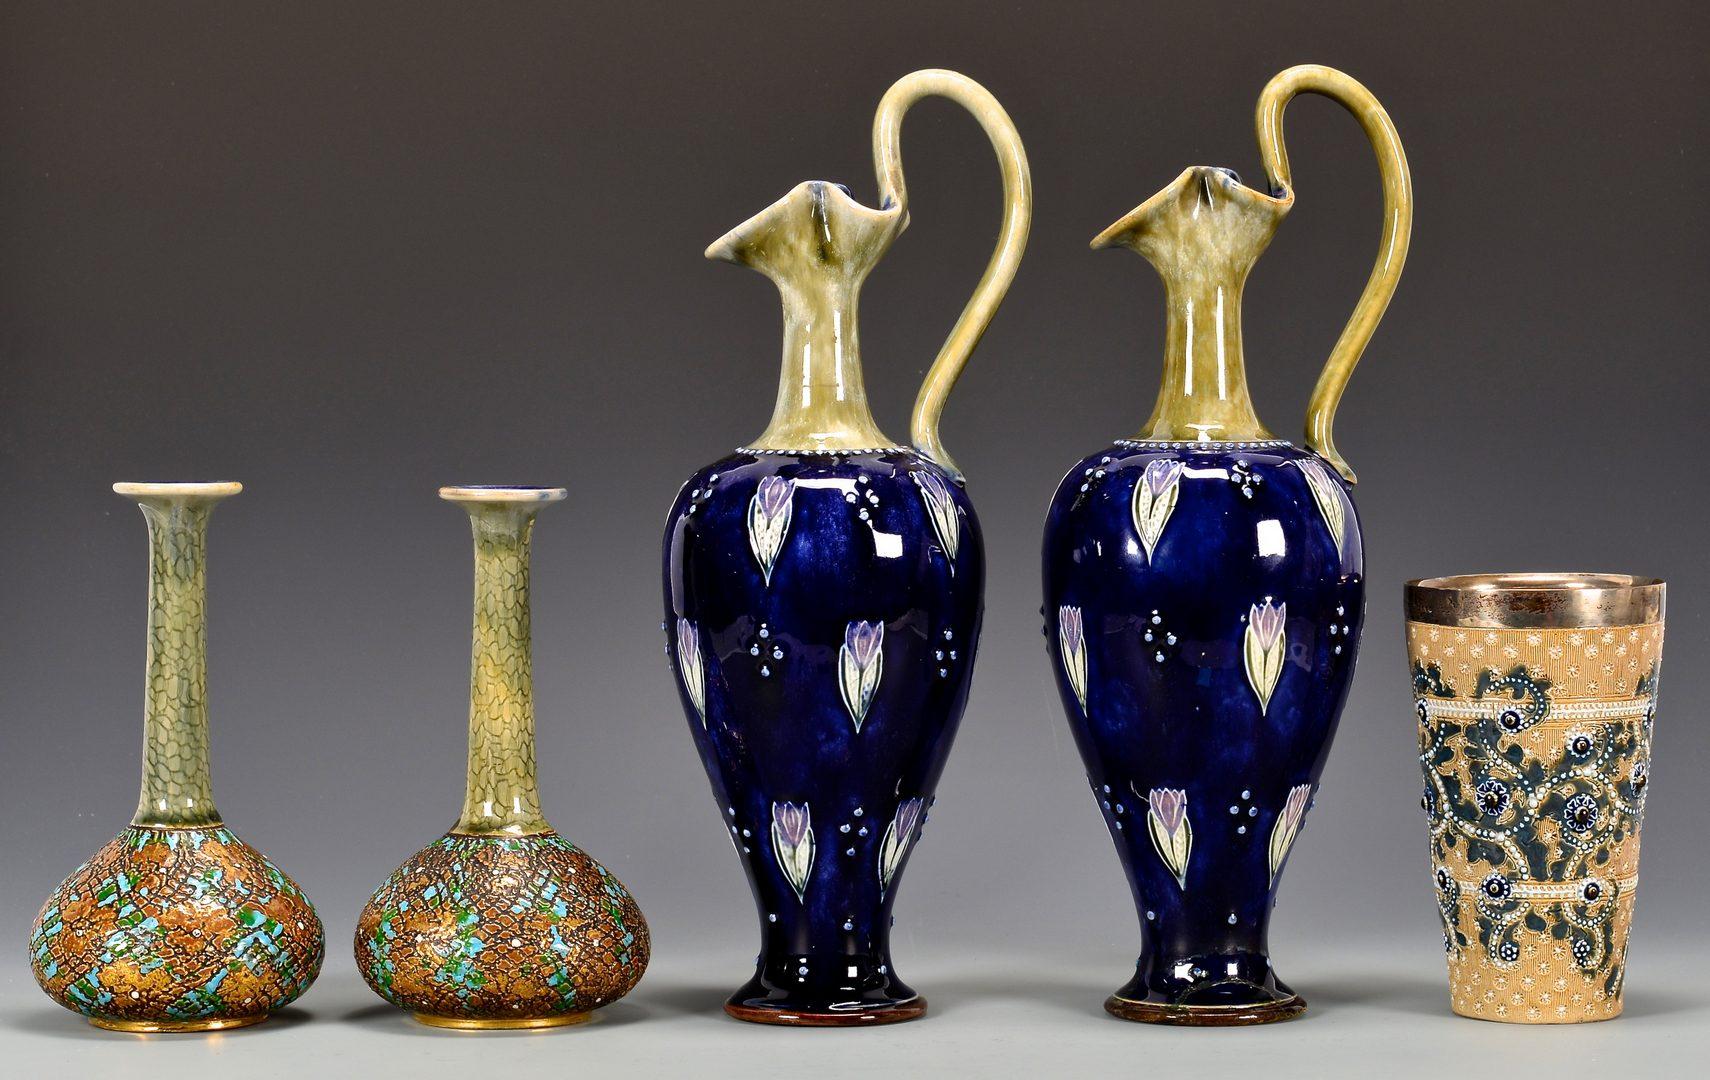 Lot 110: Group Doulton Pottery Items, 5 pcs.